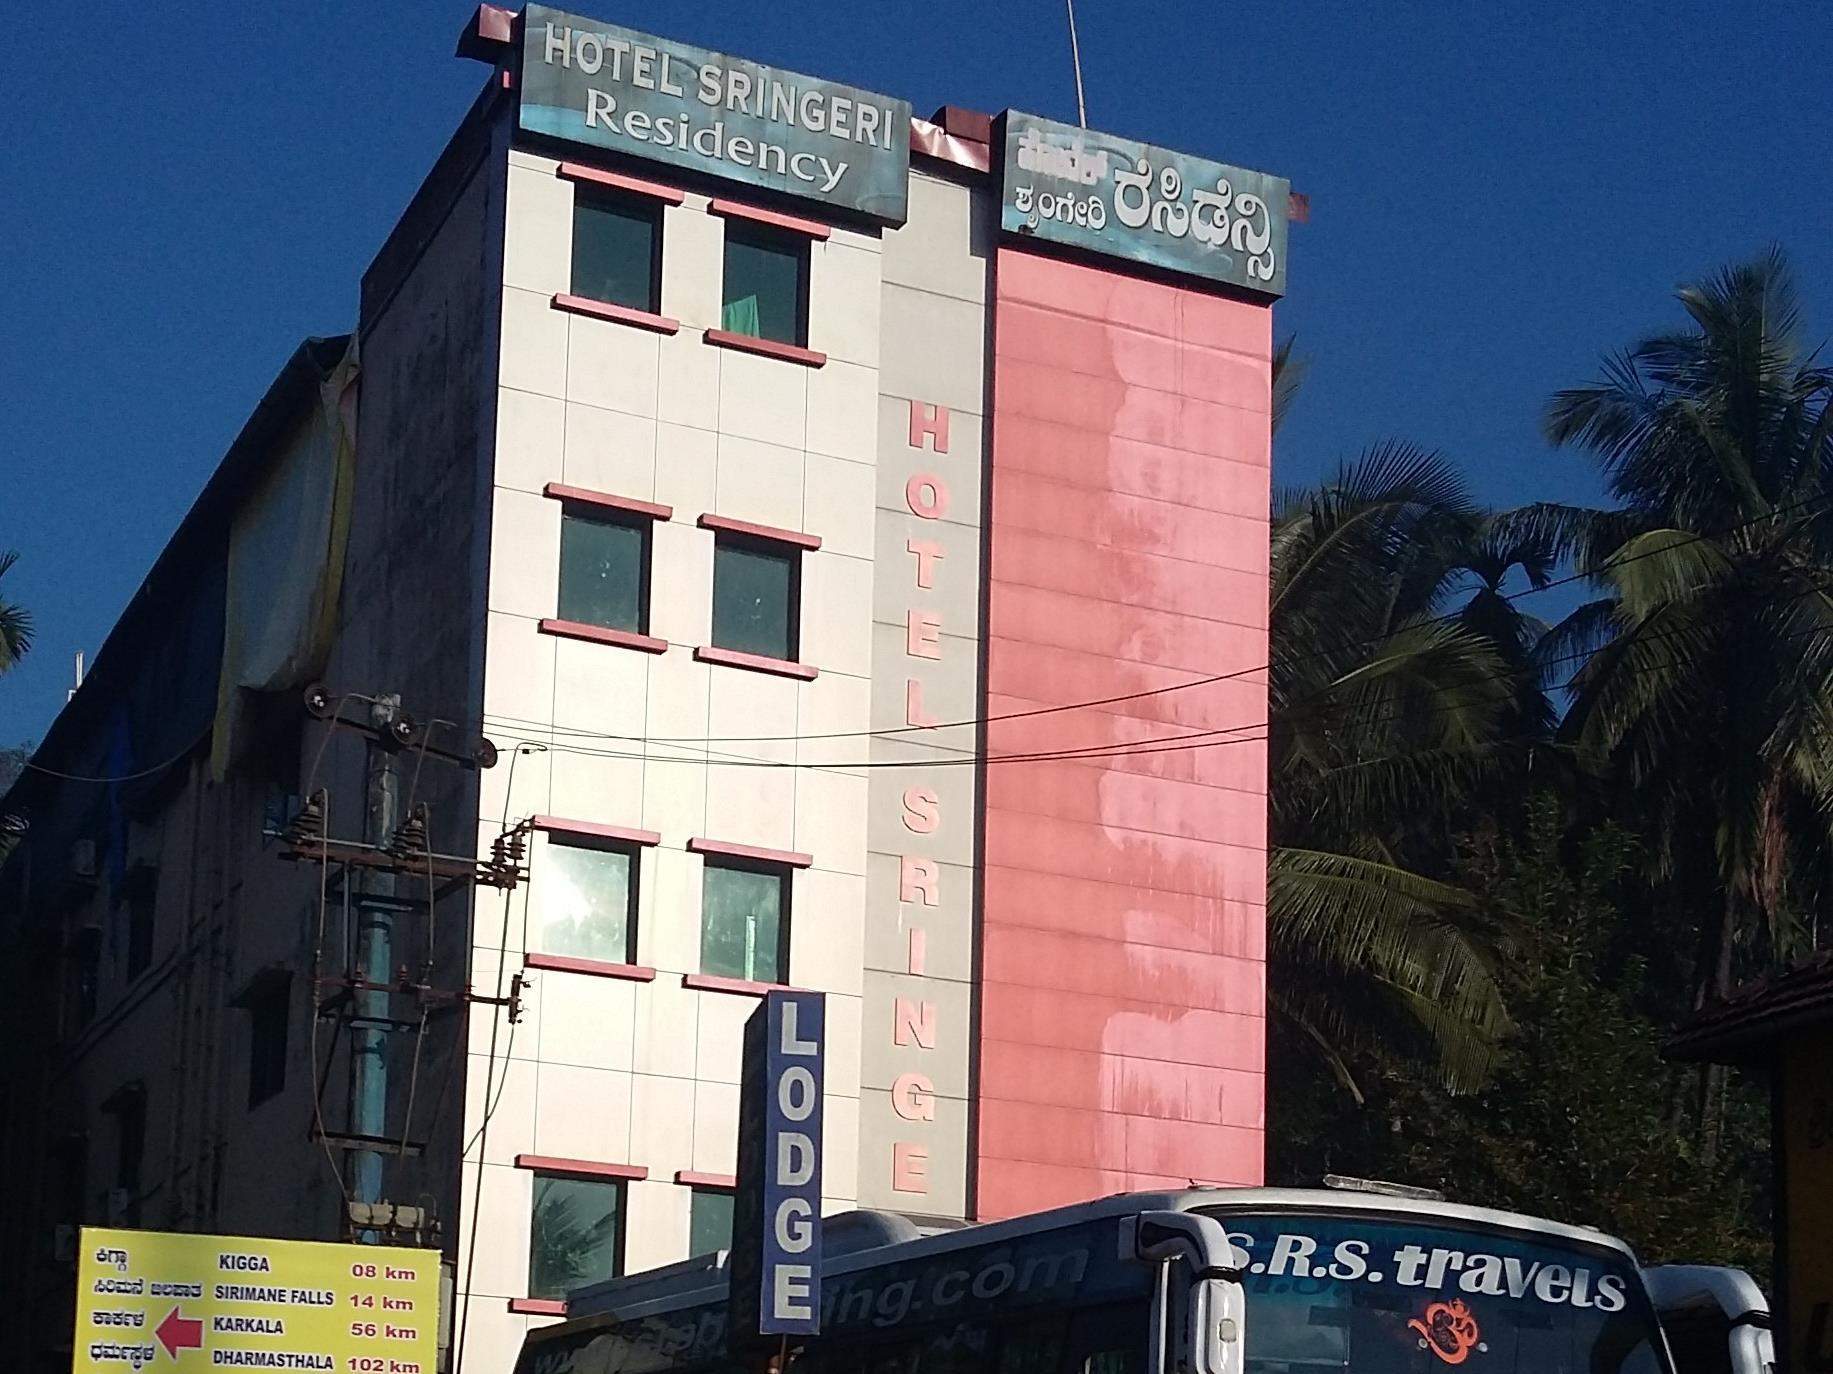 Hotel Sringeri Residency